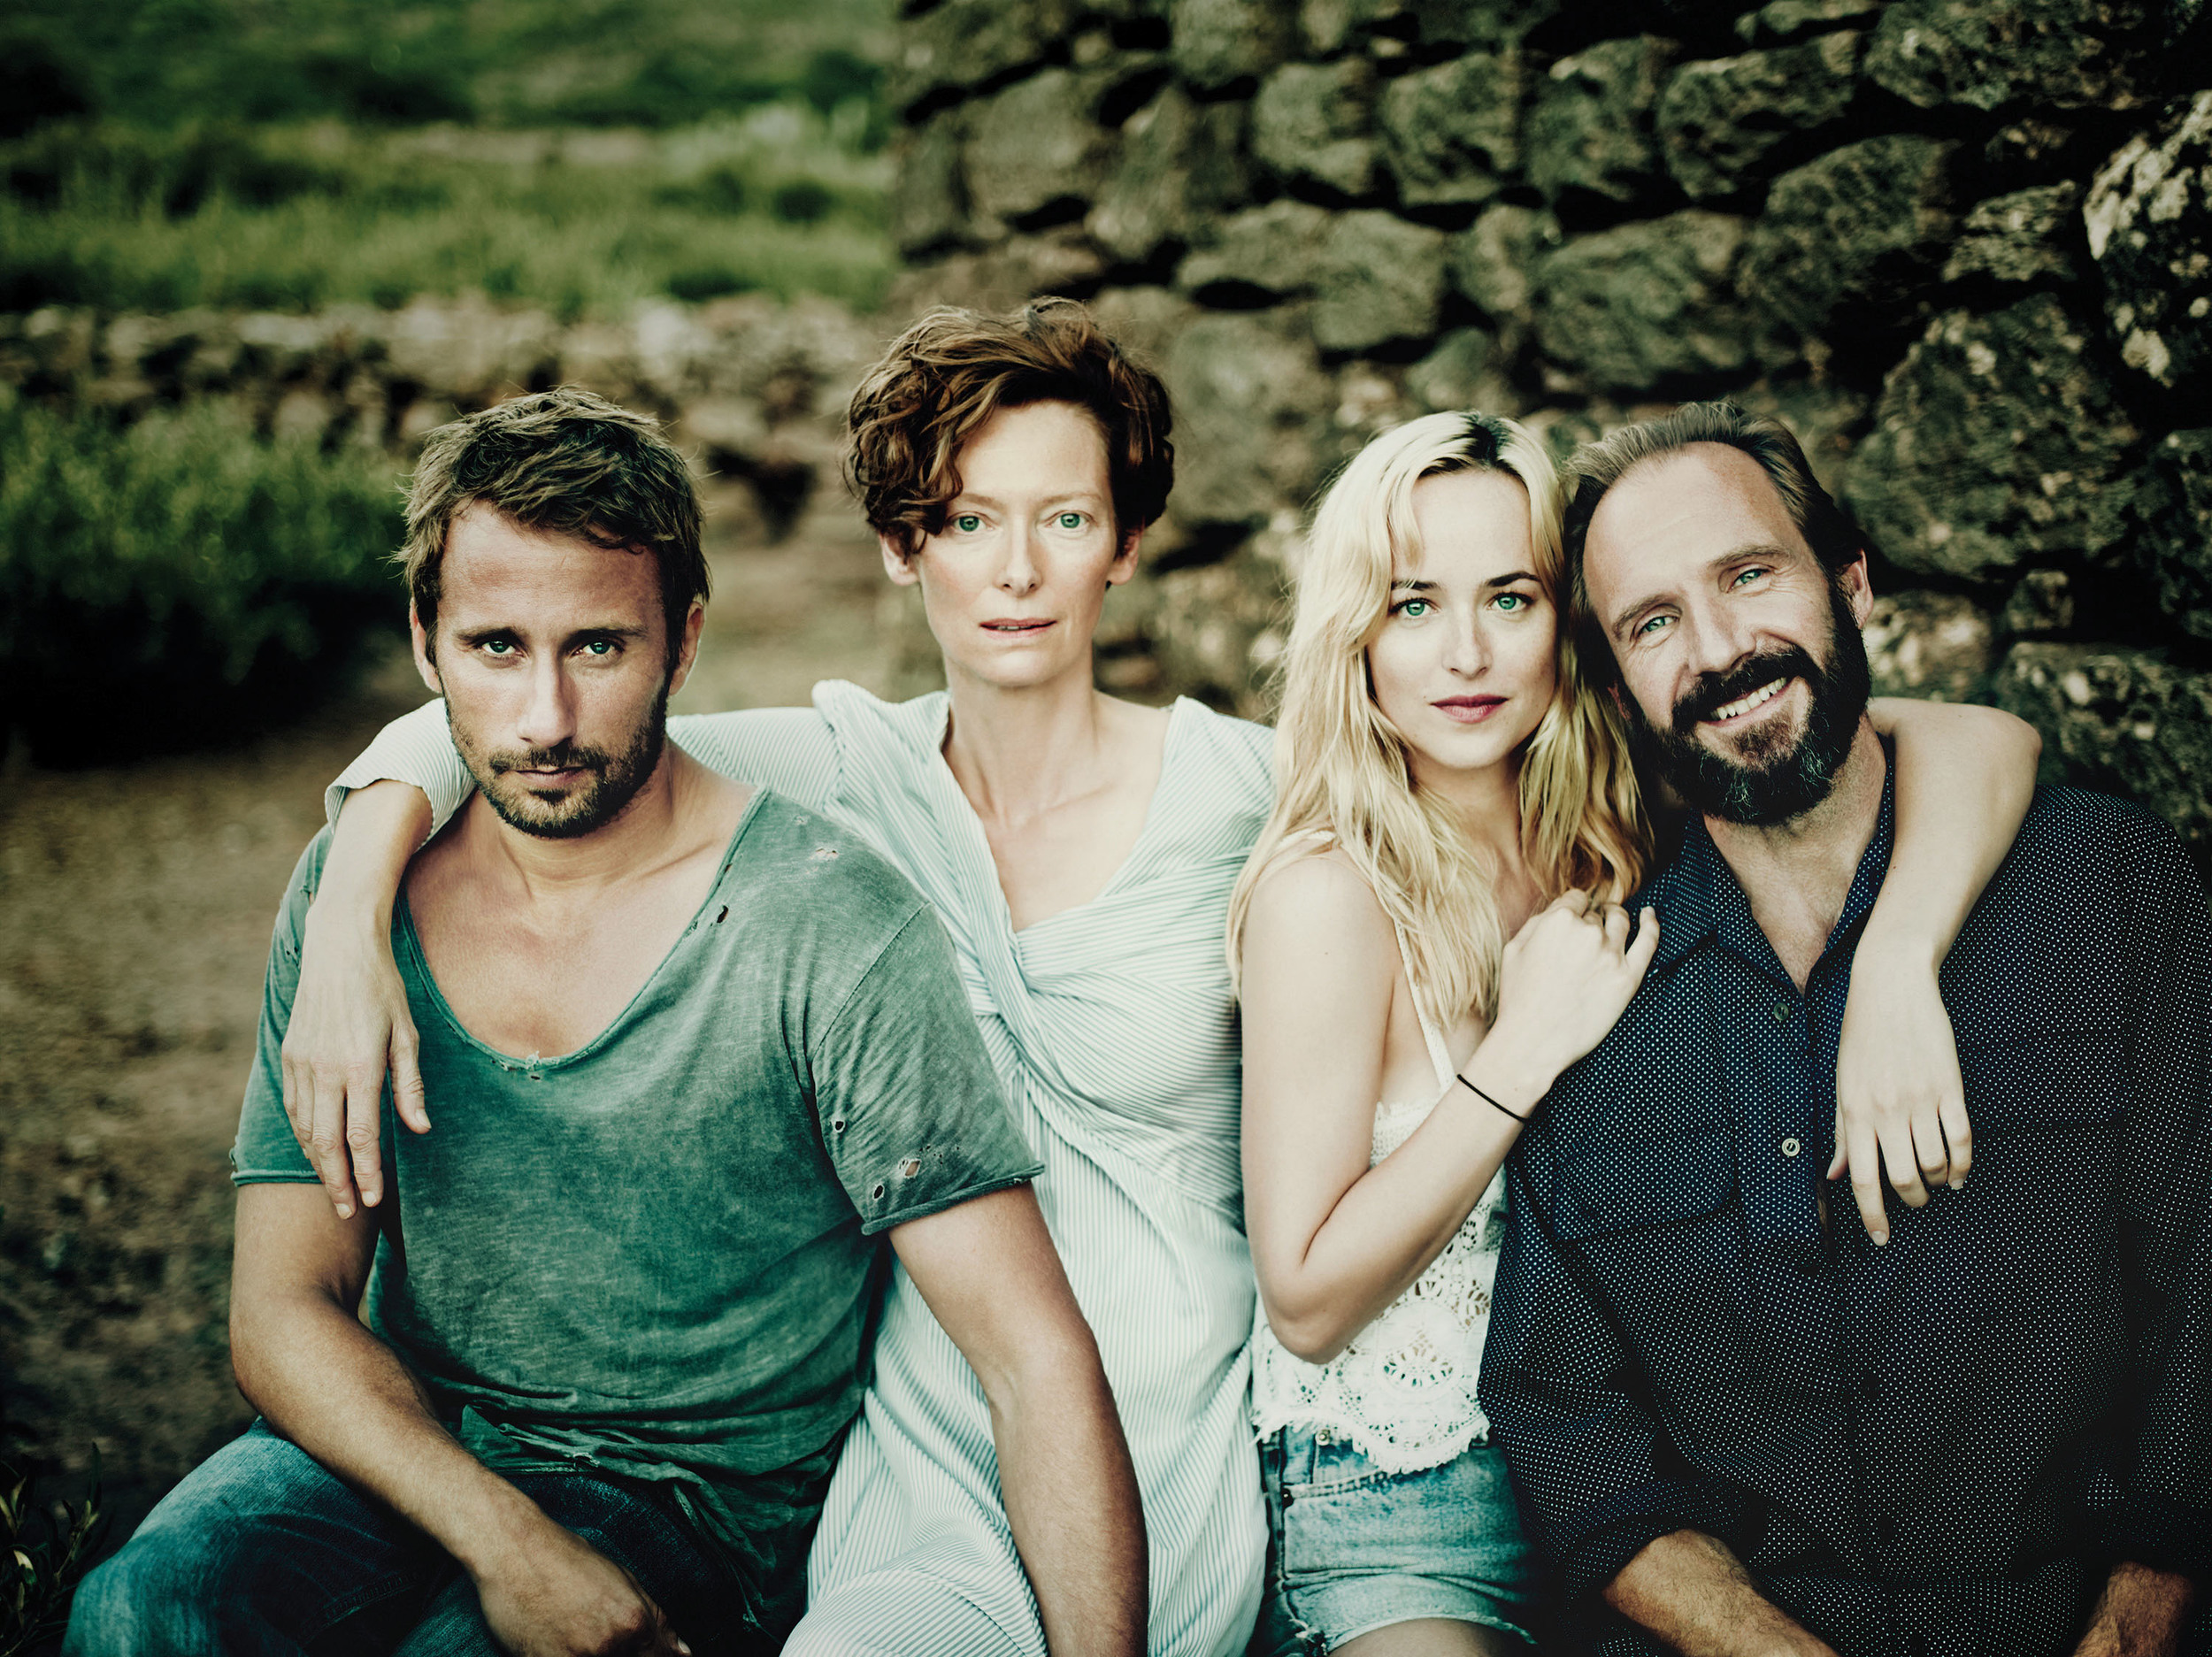 Jean-Paul/Paul (Matthias Schoenaerts),Marianne (Tilda Swinton), Penelope (Dakota Johnson) and Harry (Ralph Fiennes) in  A Bigger Splash